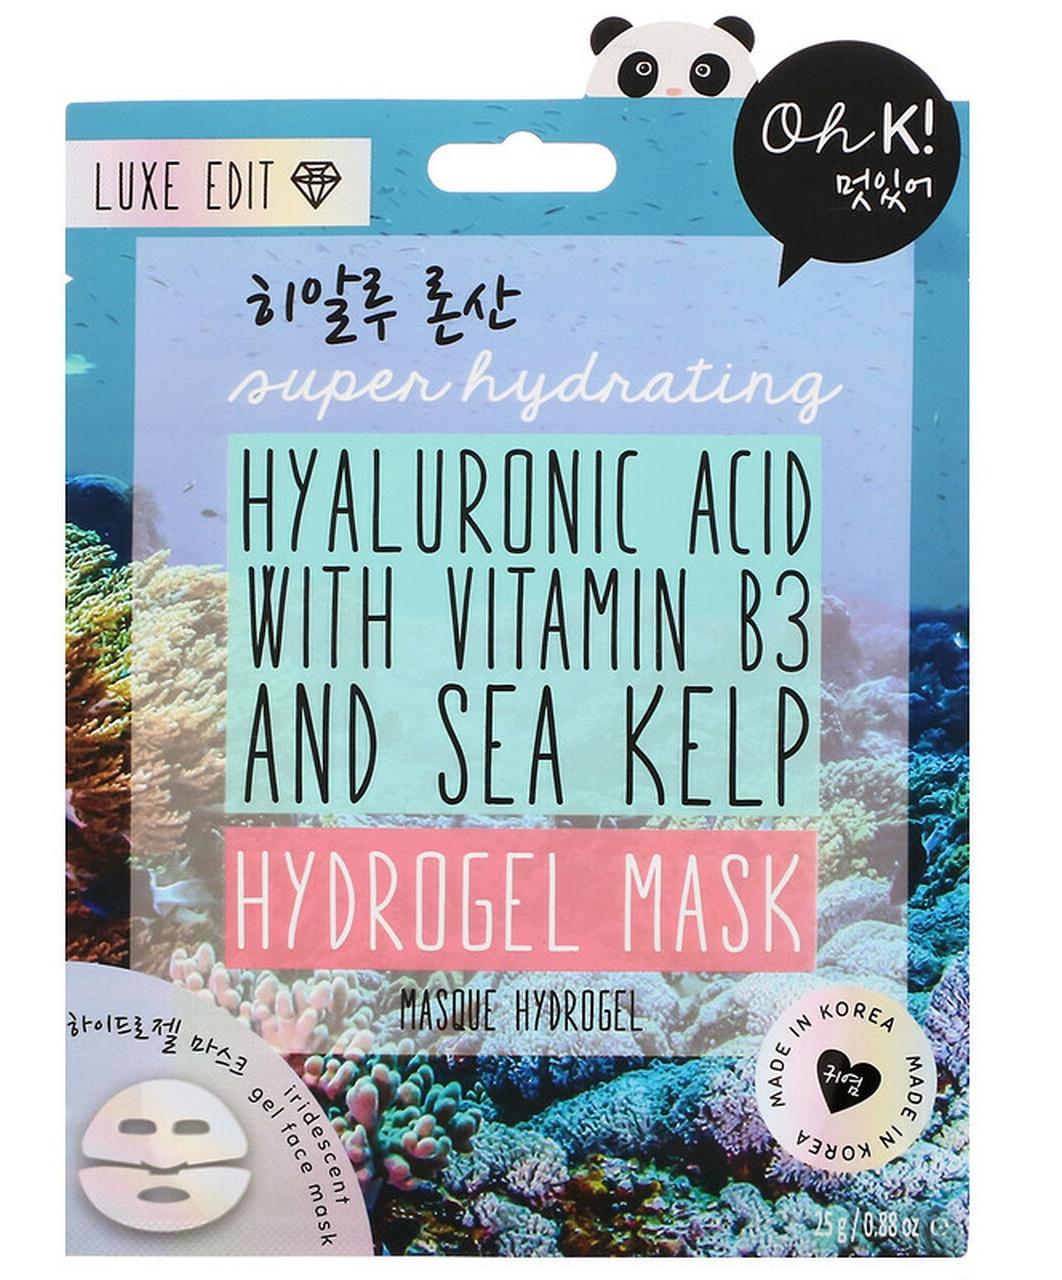 OhK! Hyaluronic Acid With Vitamin B3 And Sea Kelp